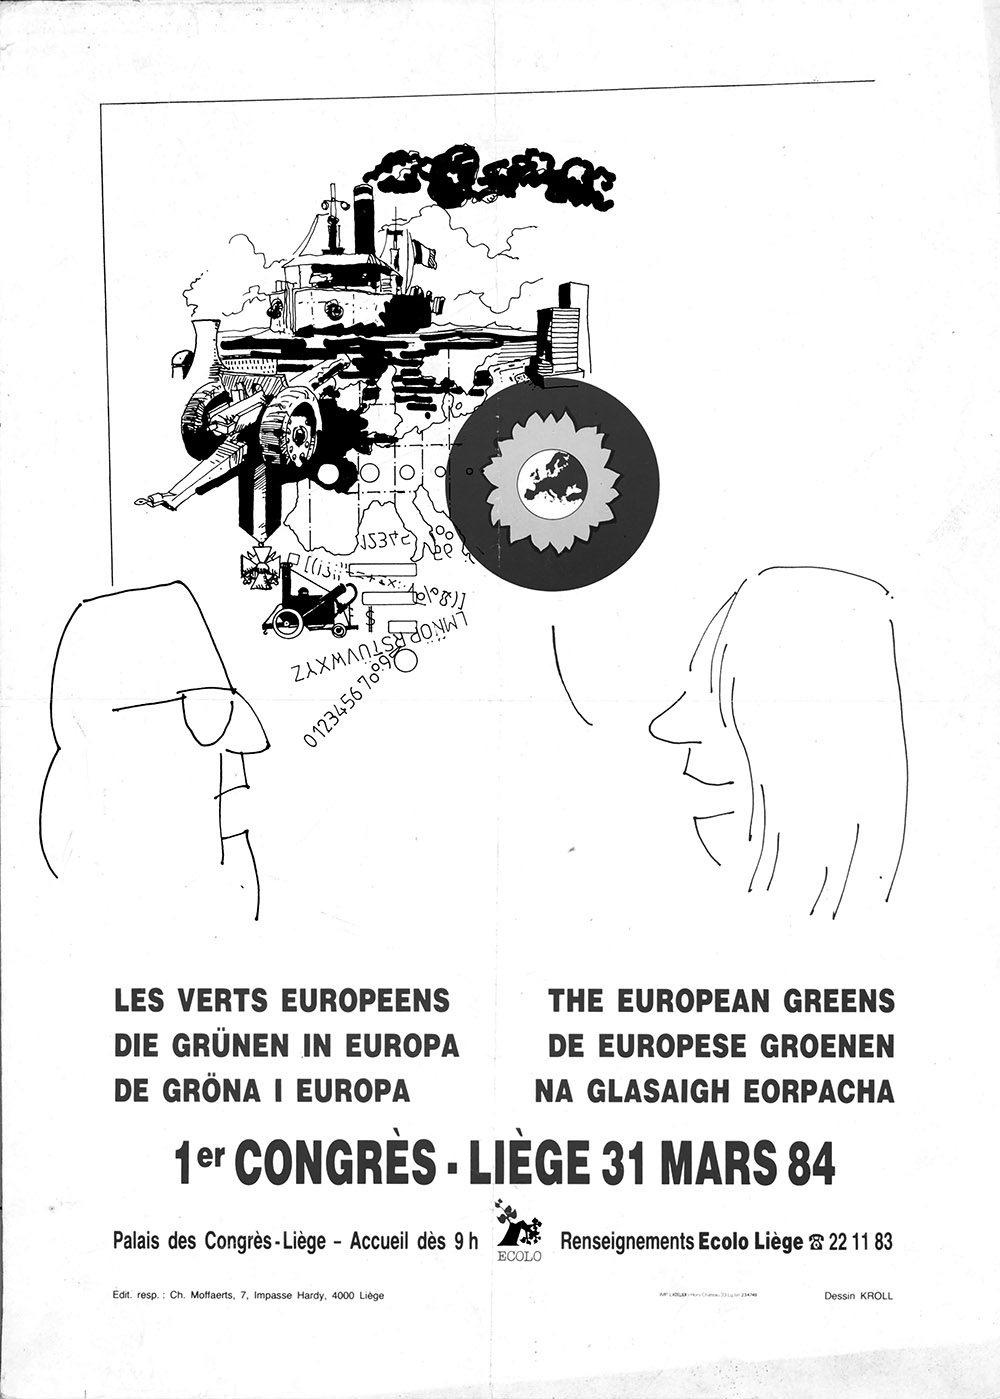 Illu_R13_Europe_et_ecologistes-2.jpg